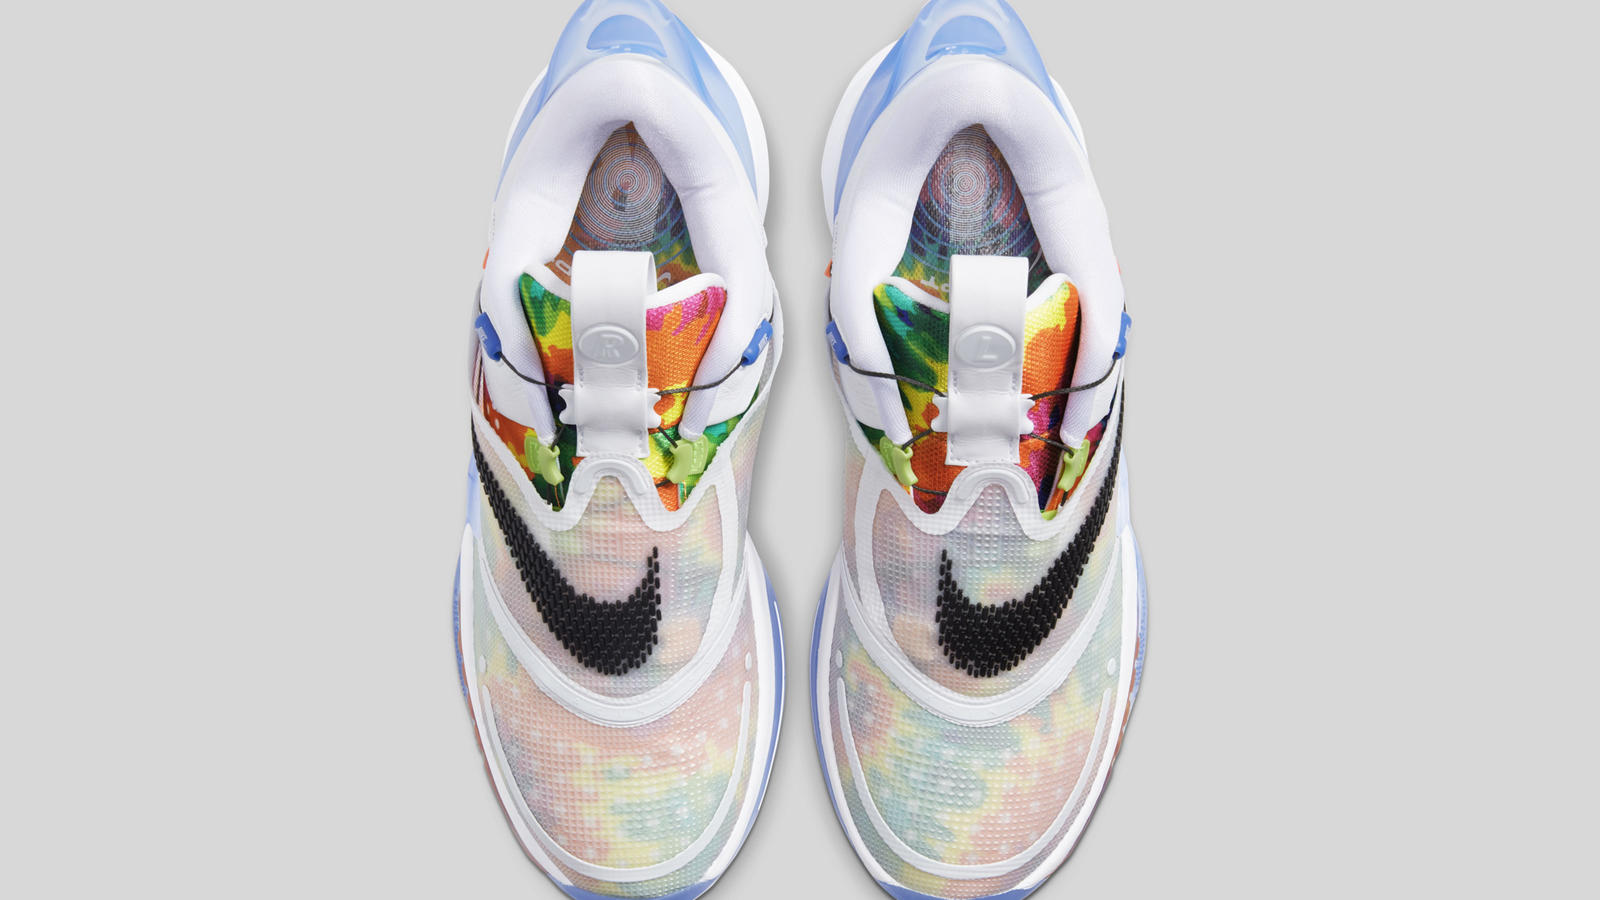 Nike Adapt BB 2.0 Tie Dye Official